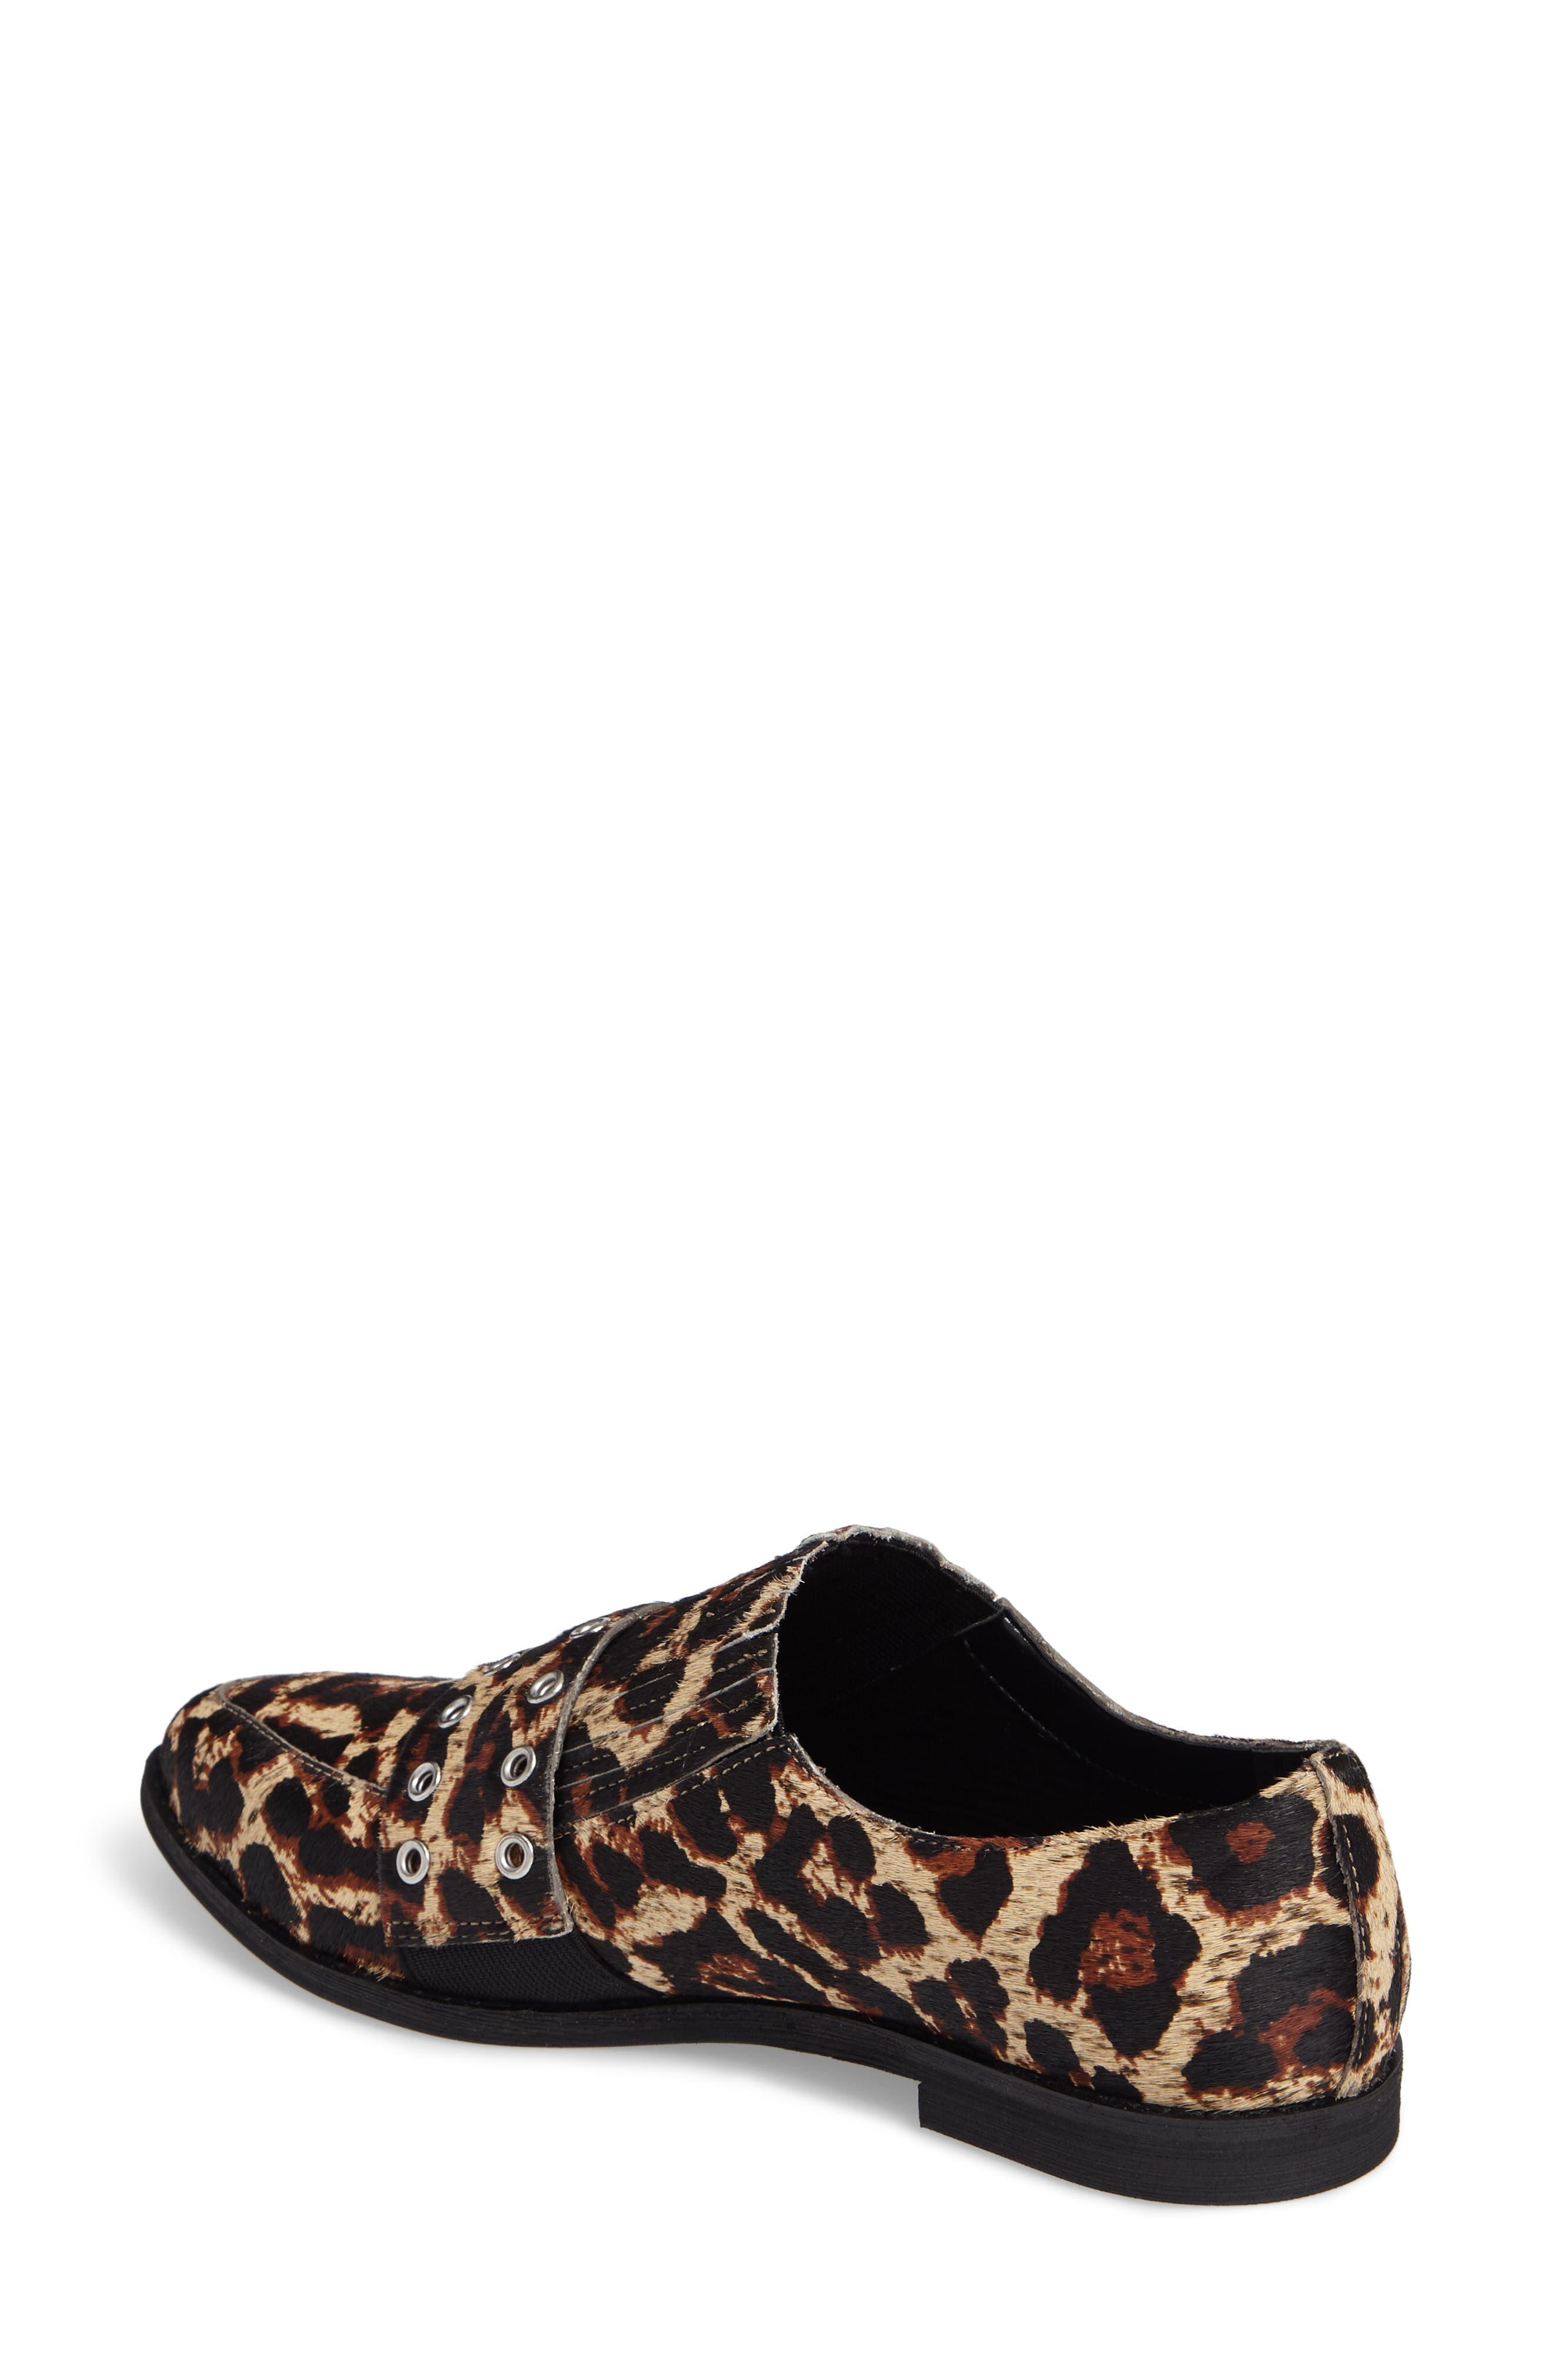 Alternate Image 2  - Treasure & Bond Ainsley Pointy Toe Loafer